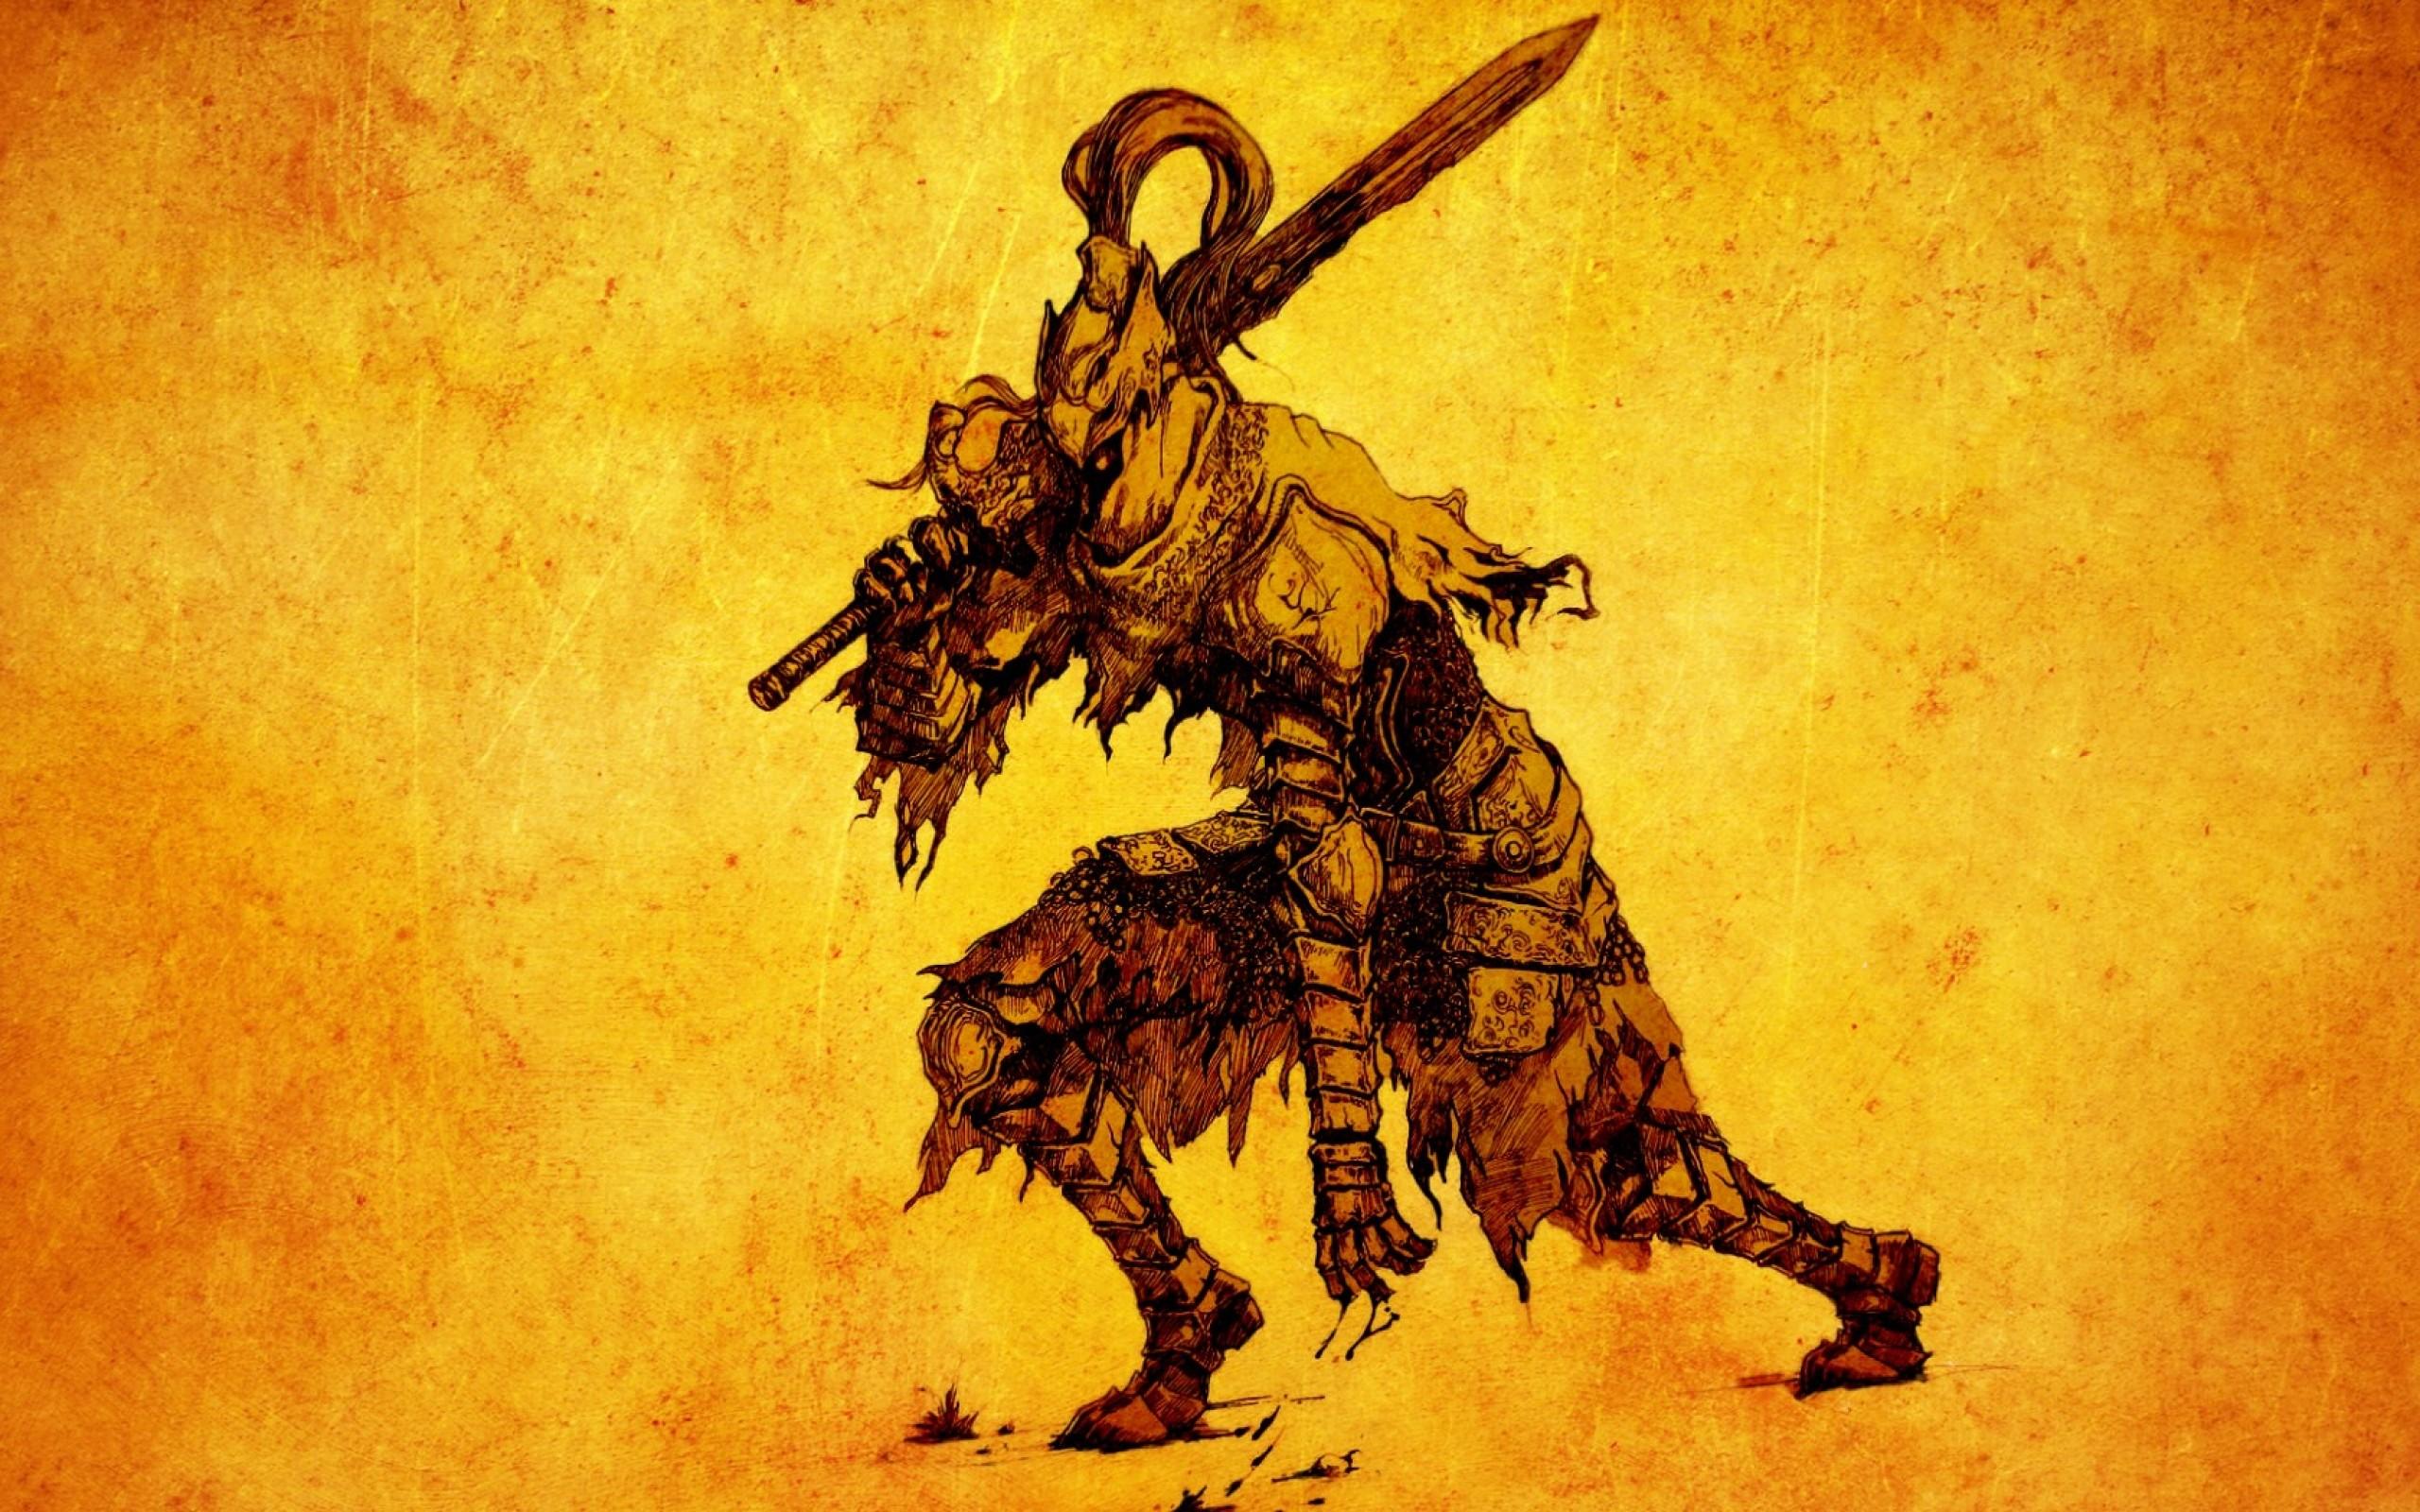 64 Dark Souls 3 Animated